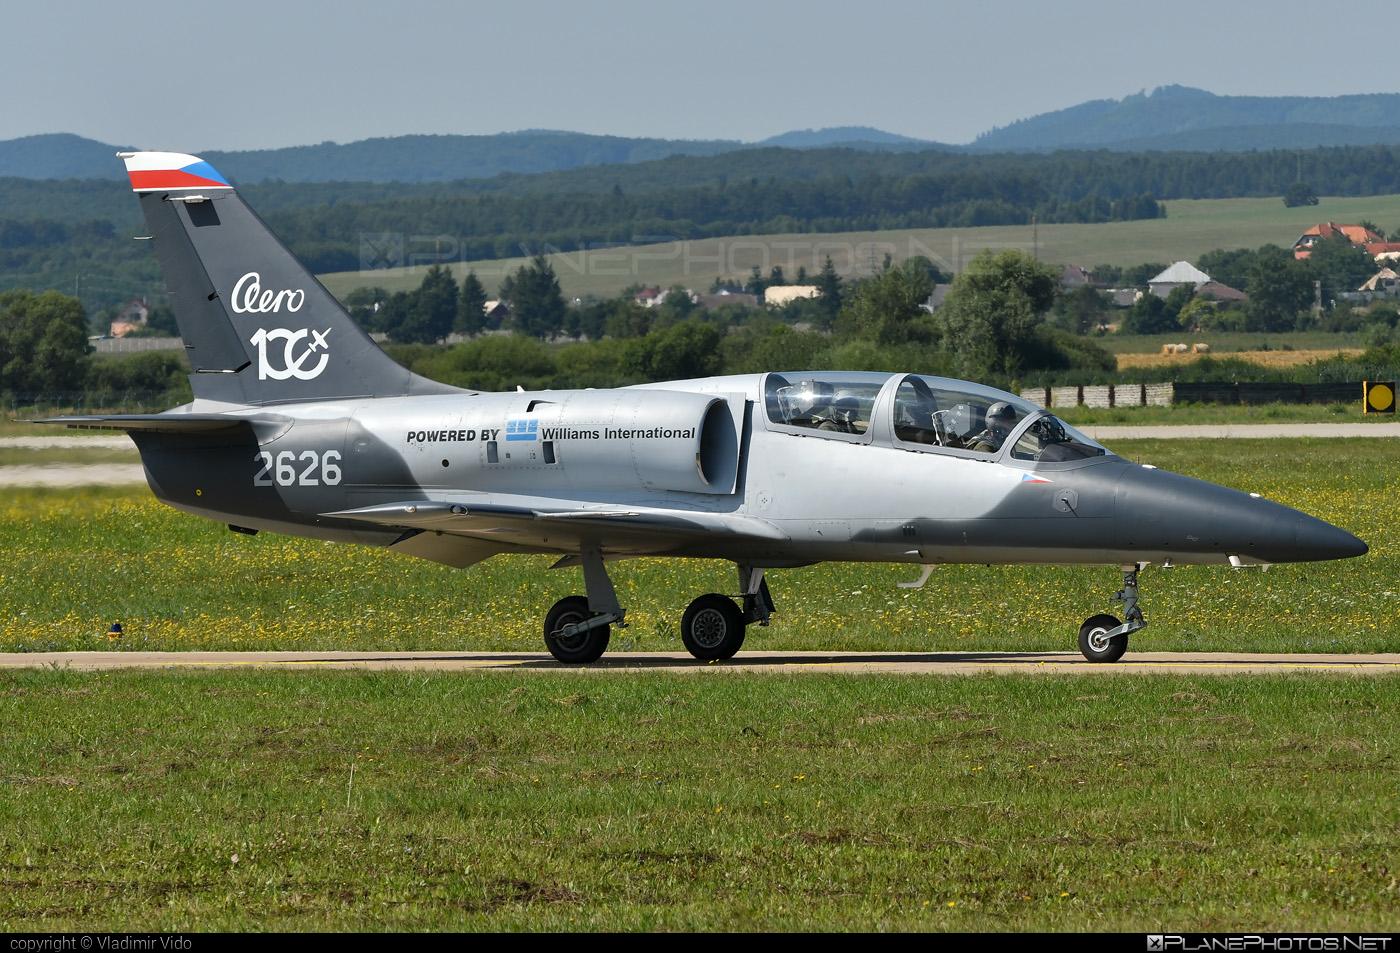 Aero L-39CW Albatros - 2626 operated by Aero Vodochody #aero #aerol39 #aerol39albatros #aerol39cwalbatros #aerovodochody #albatros #l39 #l39cw #l39cwalbatros #siaf2019